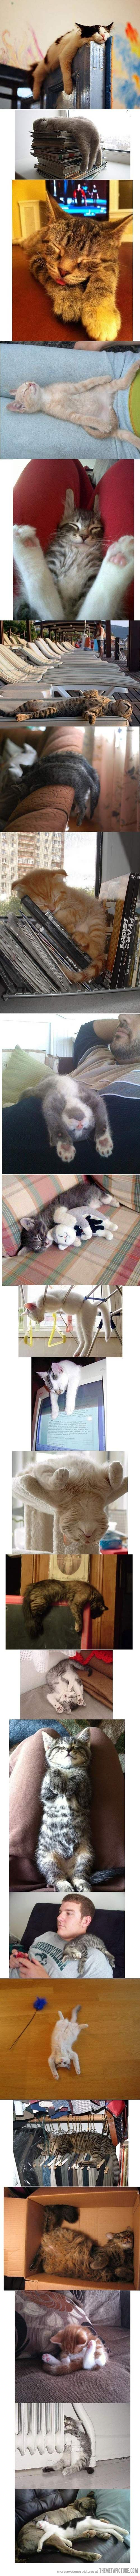 Cats sleep anywhere…: Cats sleep anywhere…